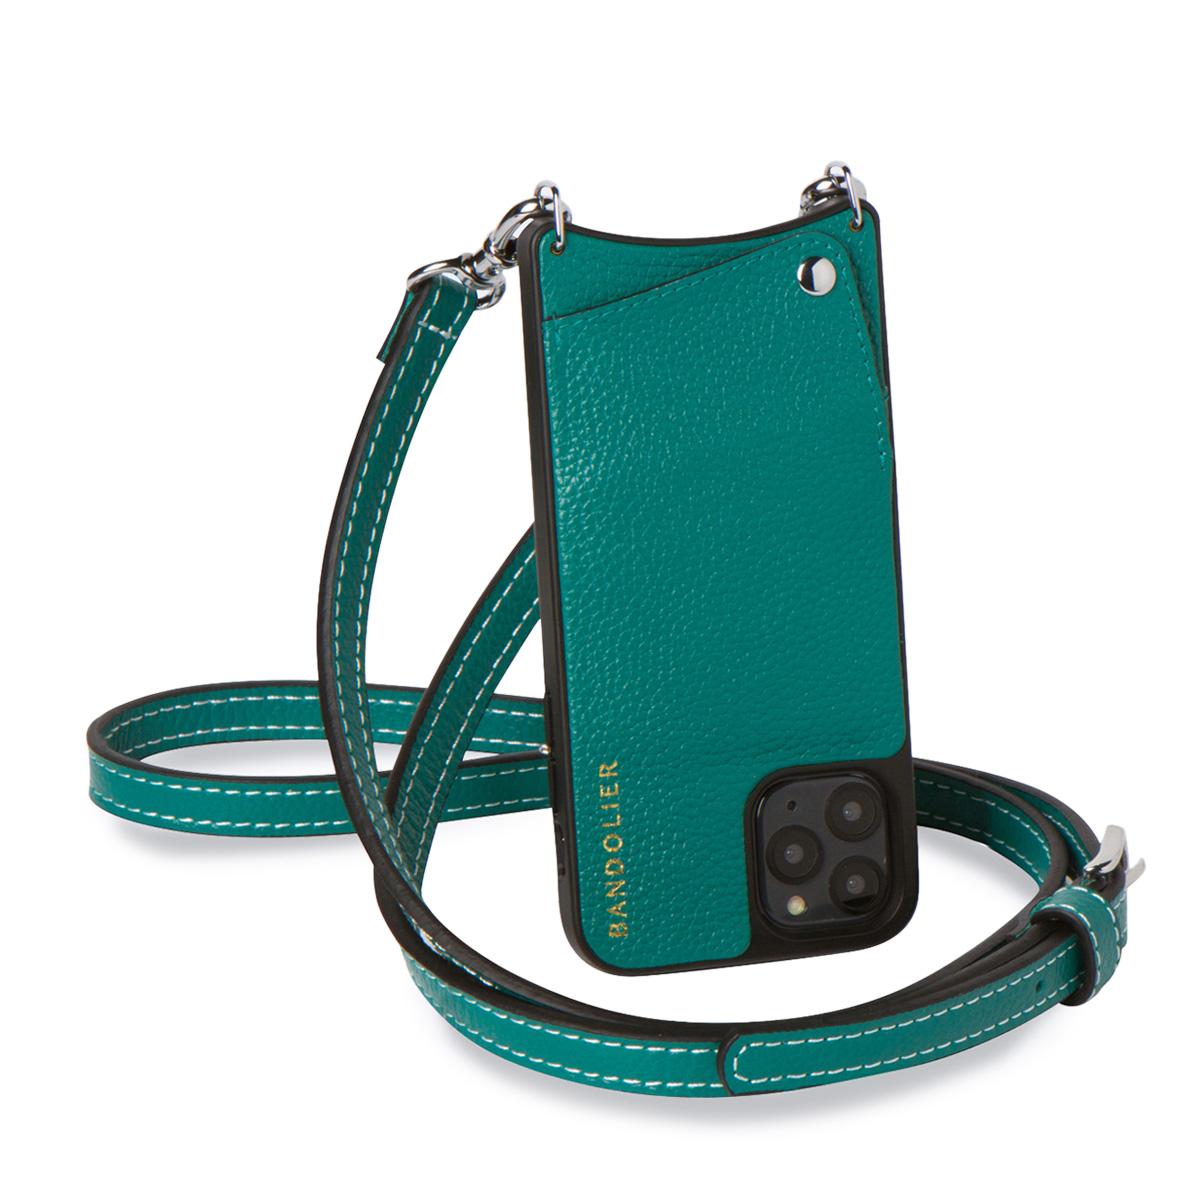 BANDOLIER バンドリヤー iPhone XS X ケース スマホ 携帯 ショルダー アイフォン ケイシー メンズ レディース CASEY グリーン 10CAS [4/13 新入荷]